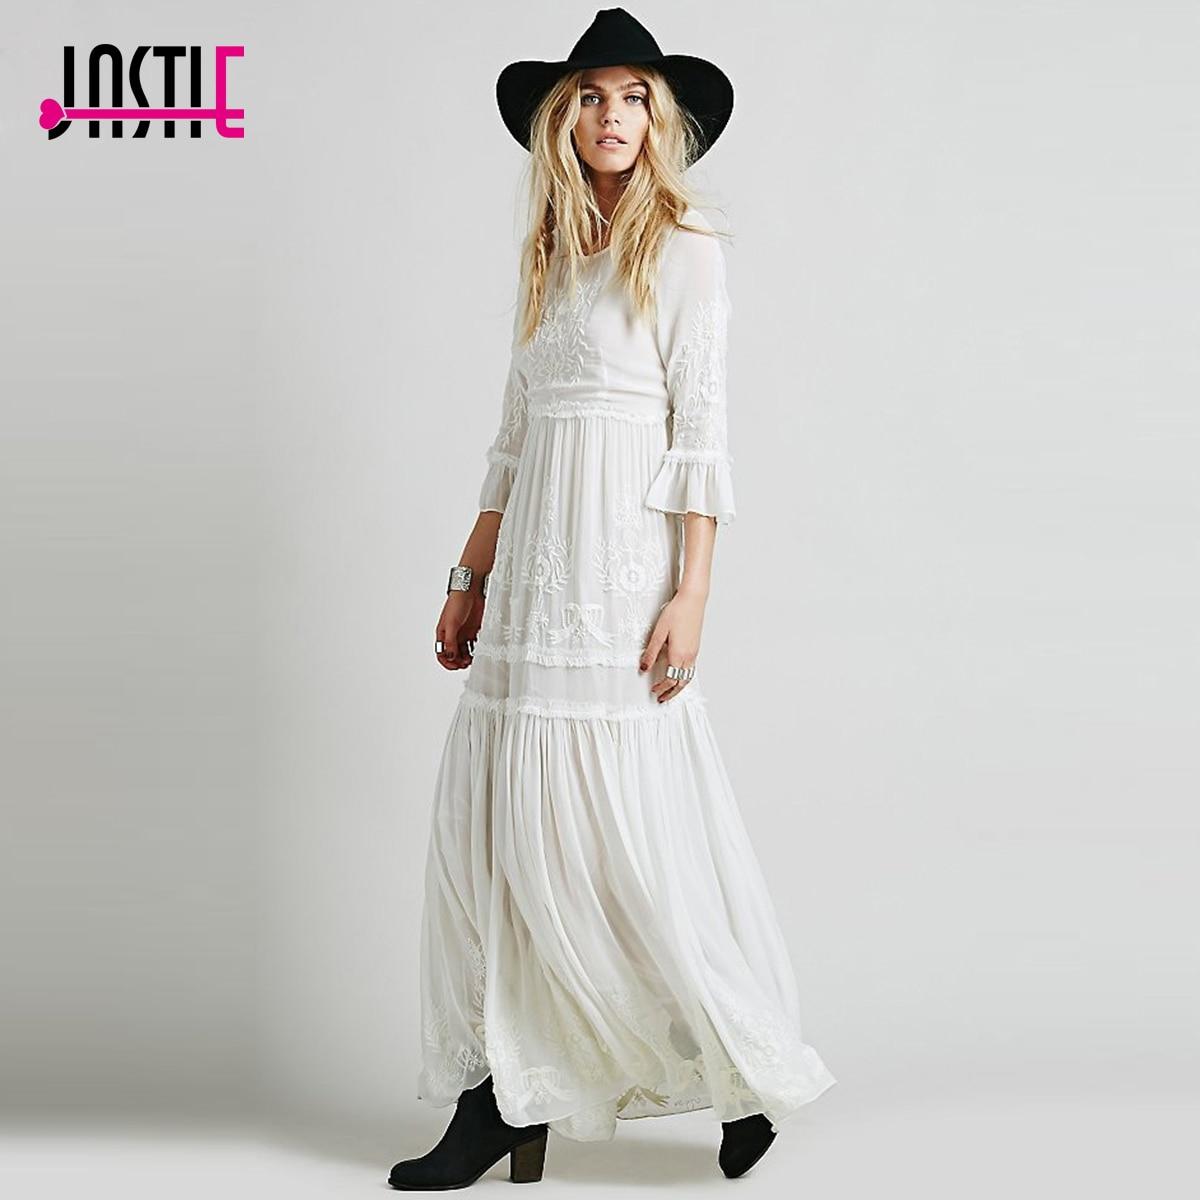 Aliexpress Com Buy Elegant Flare Sleeve Wedding Dress: Jastie Elegant Women Boho Dress Flare Sleeve O Neck